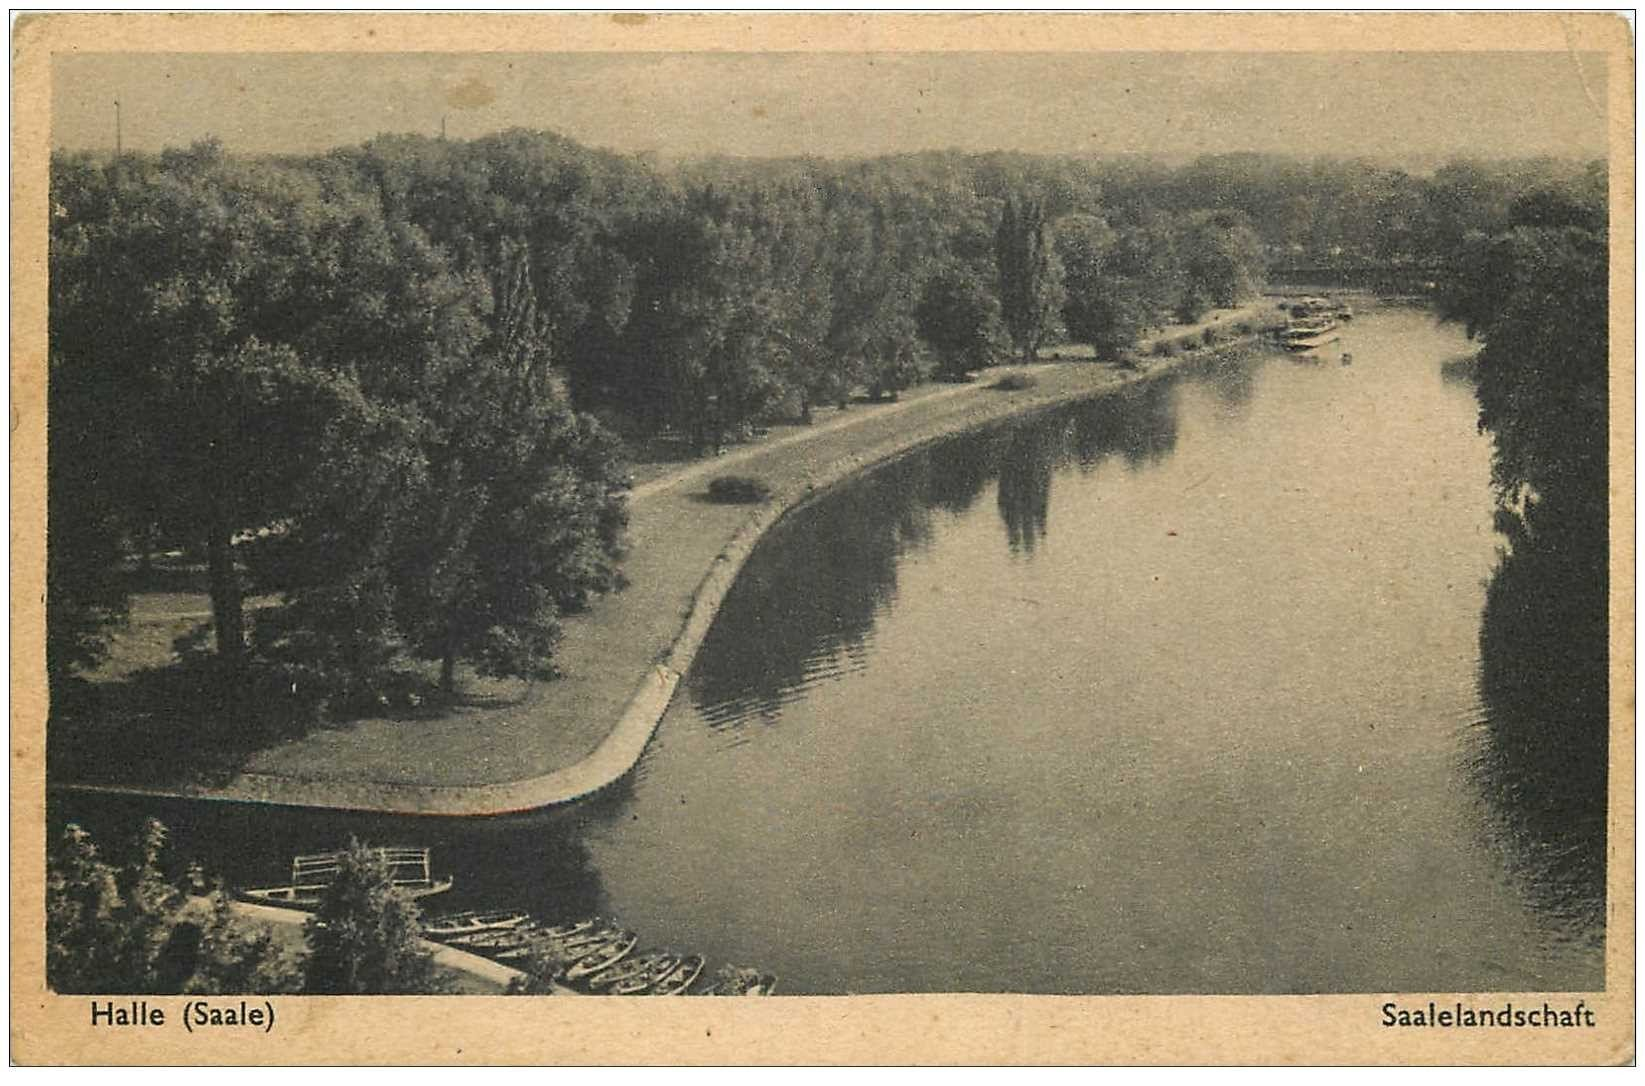 carte postale ancienne DEUTSCH ALLEMAGNE. Halle Saale Saalelandschaft